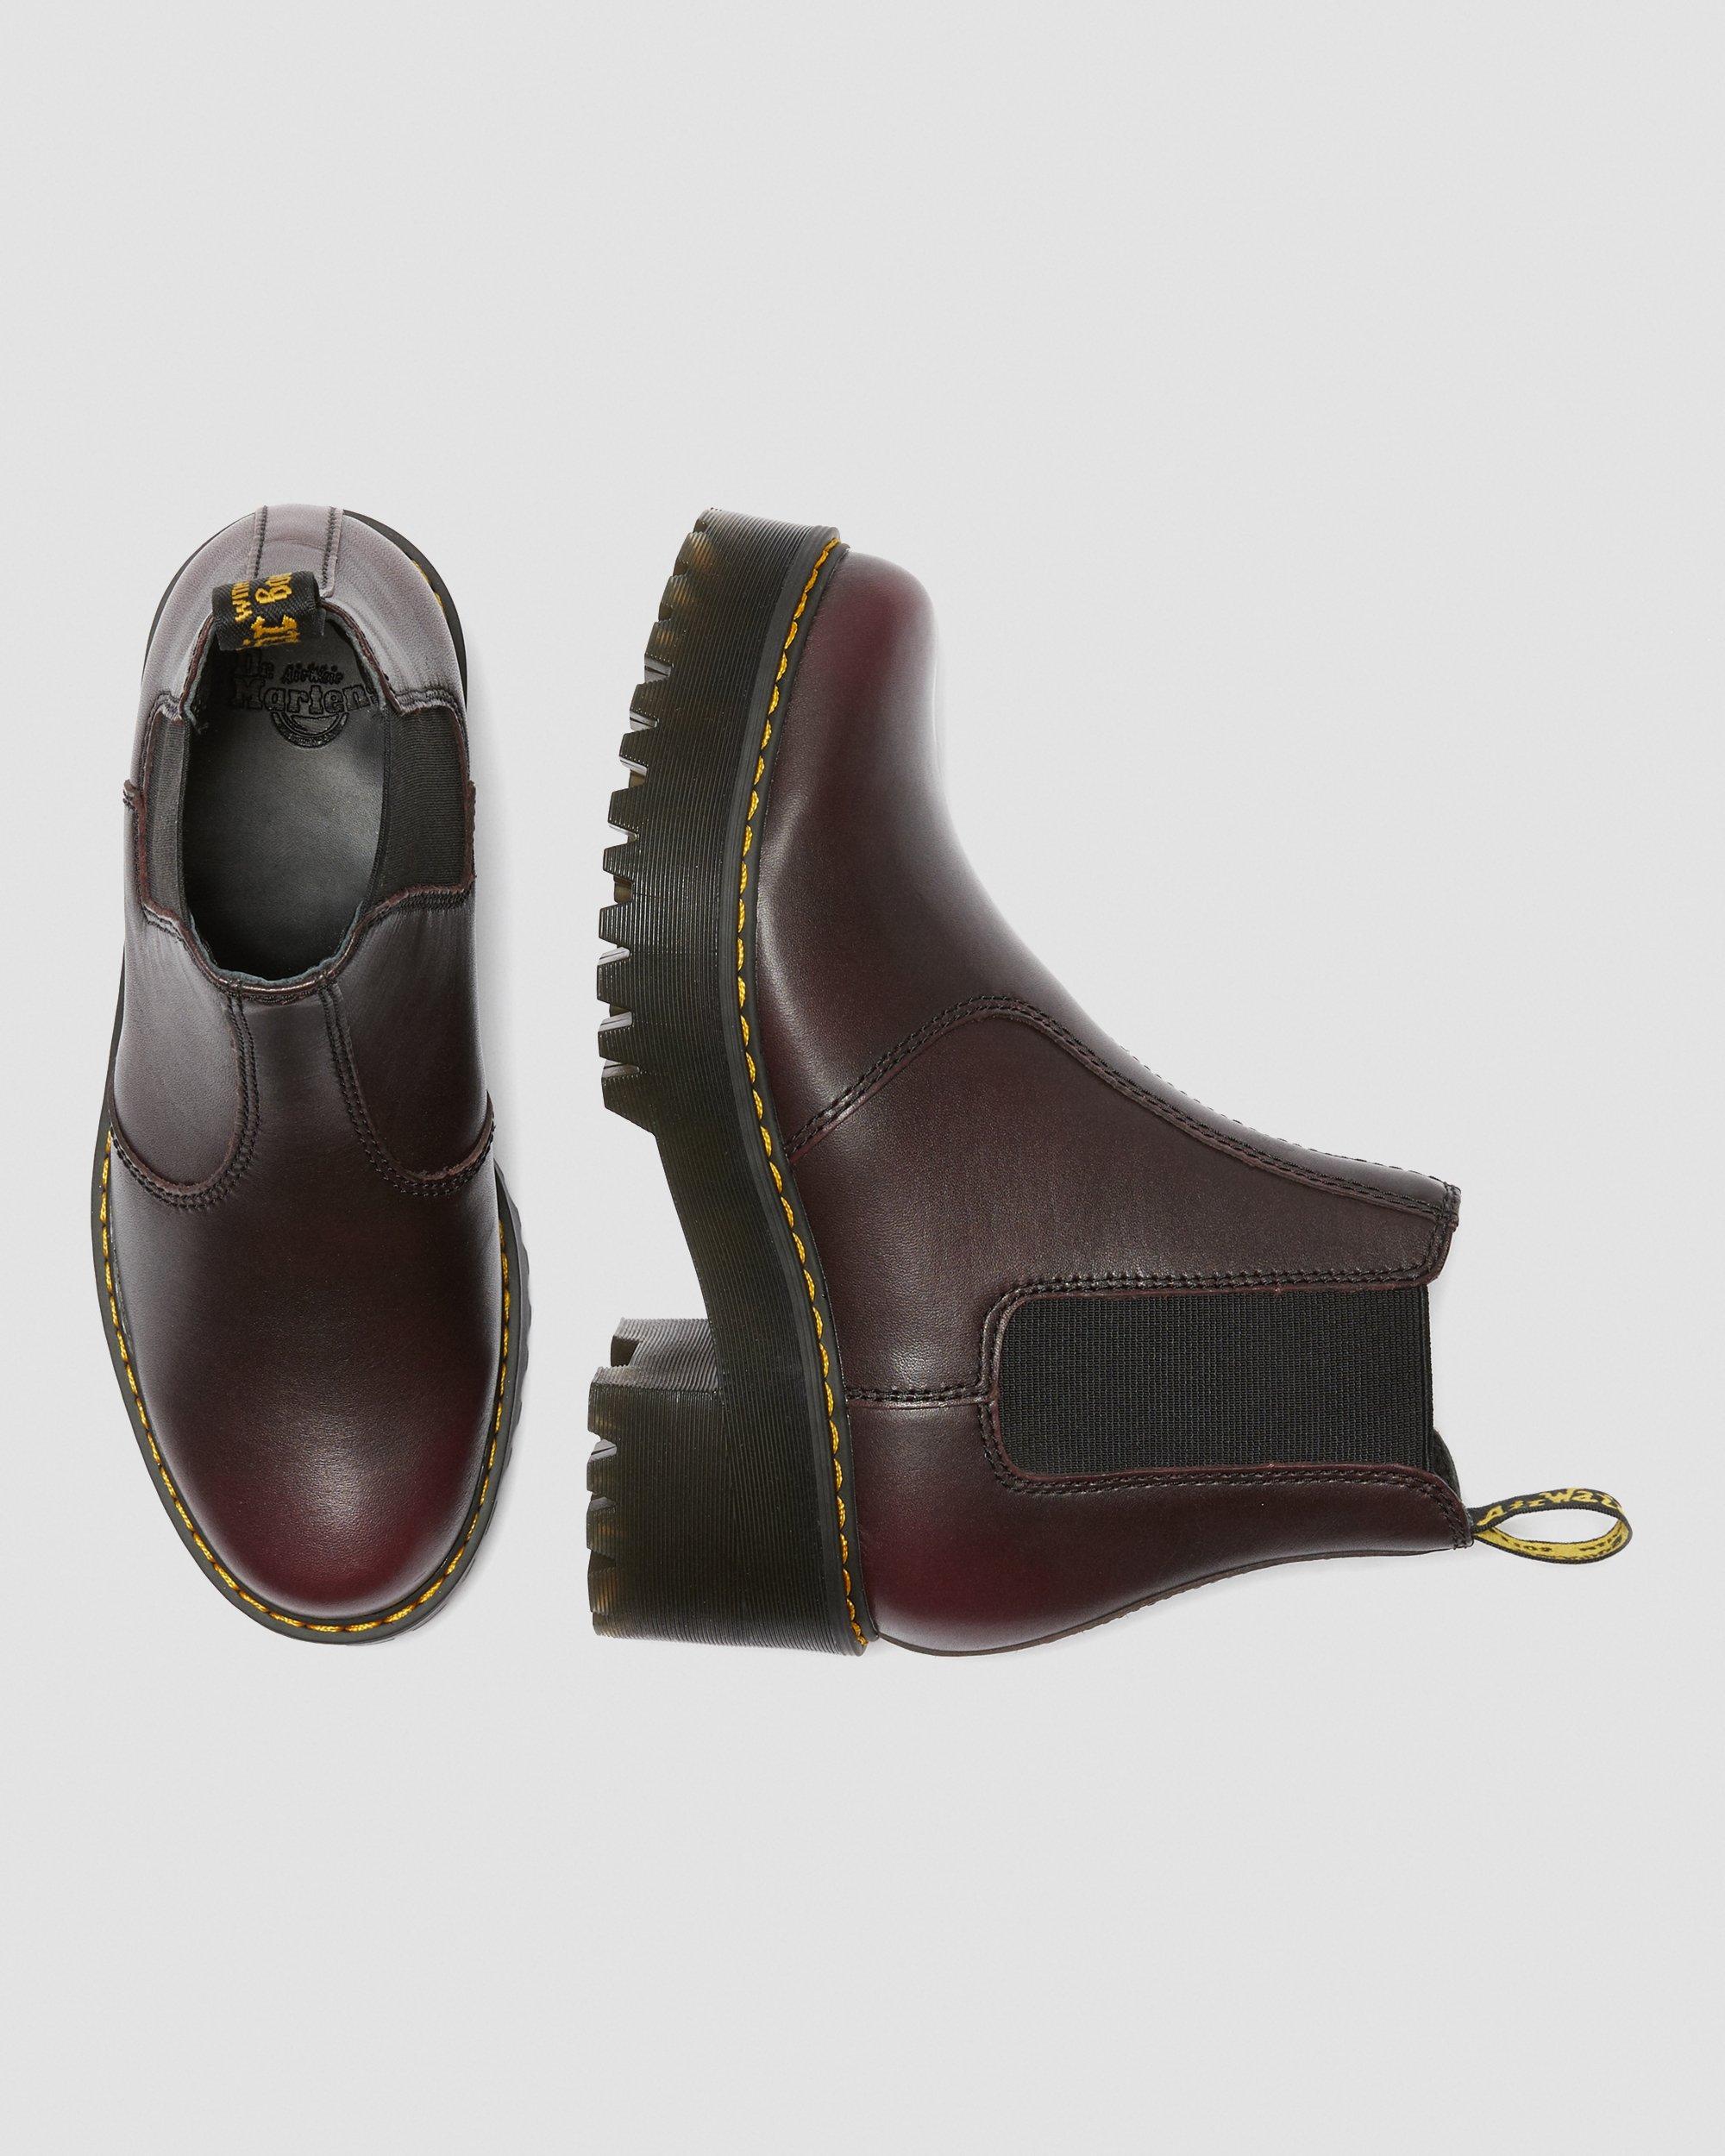 DR MARTENS Rometty Vintage Leder Chelsea Boots